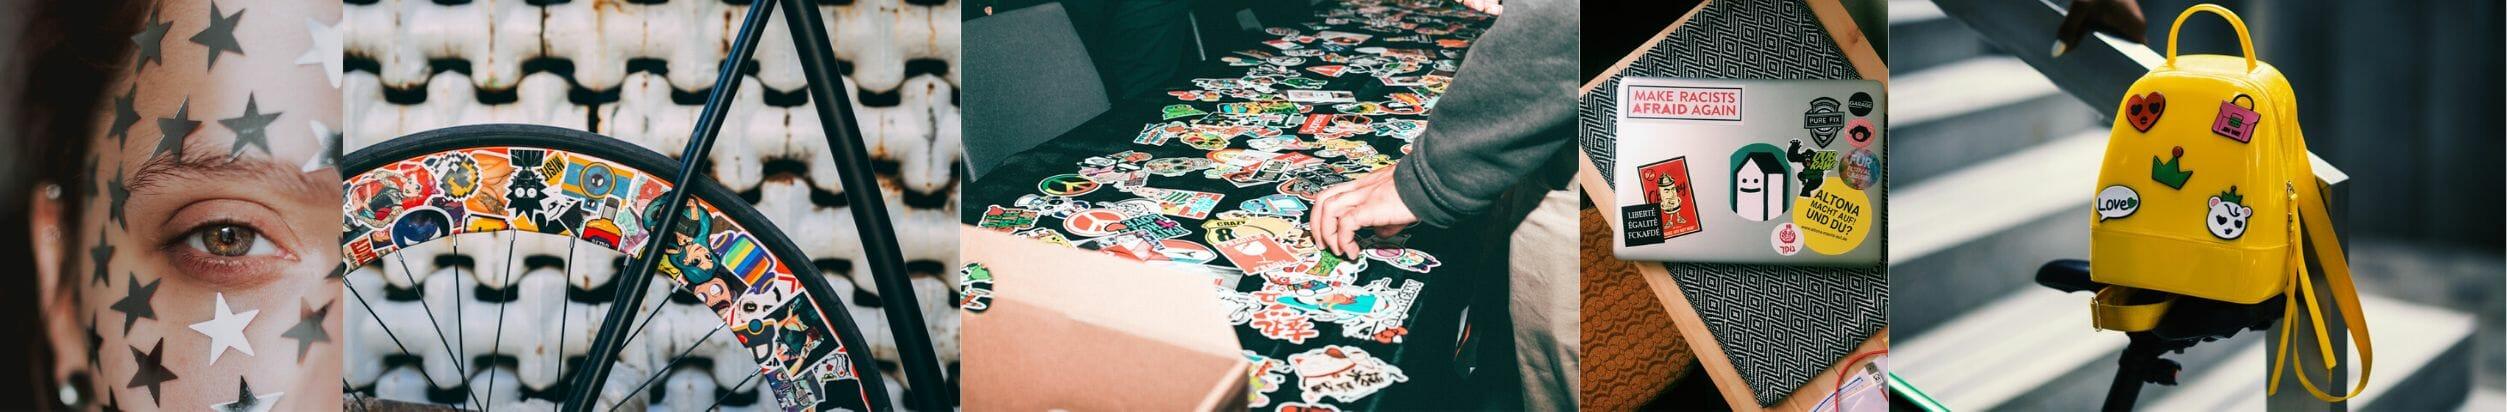 stickers uk